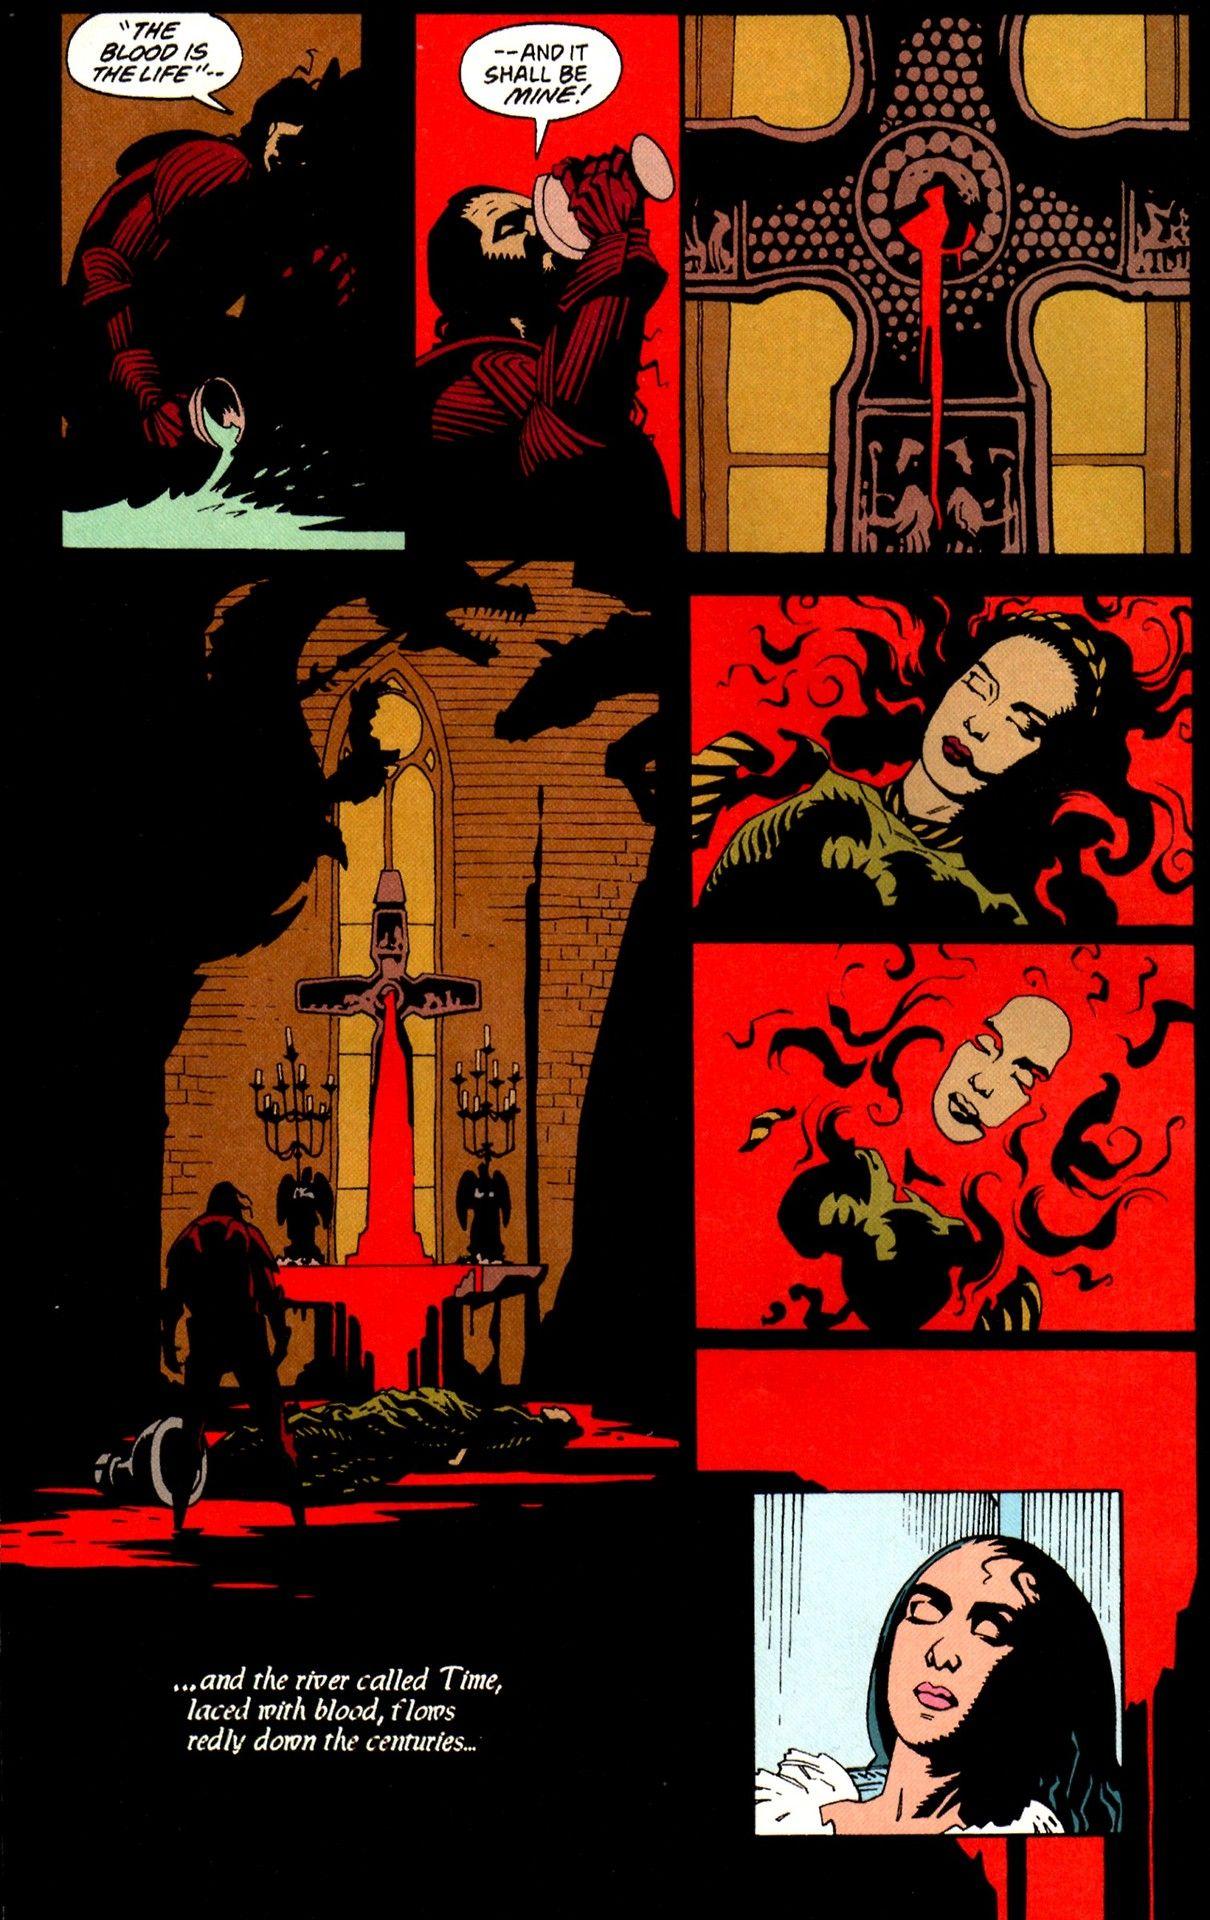 Bram Stoker's Dracula Script by Roy Thomas, art by Mike Mignola, panel 1.jpg